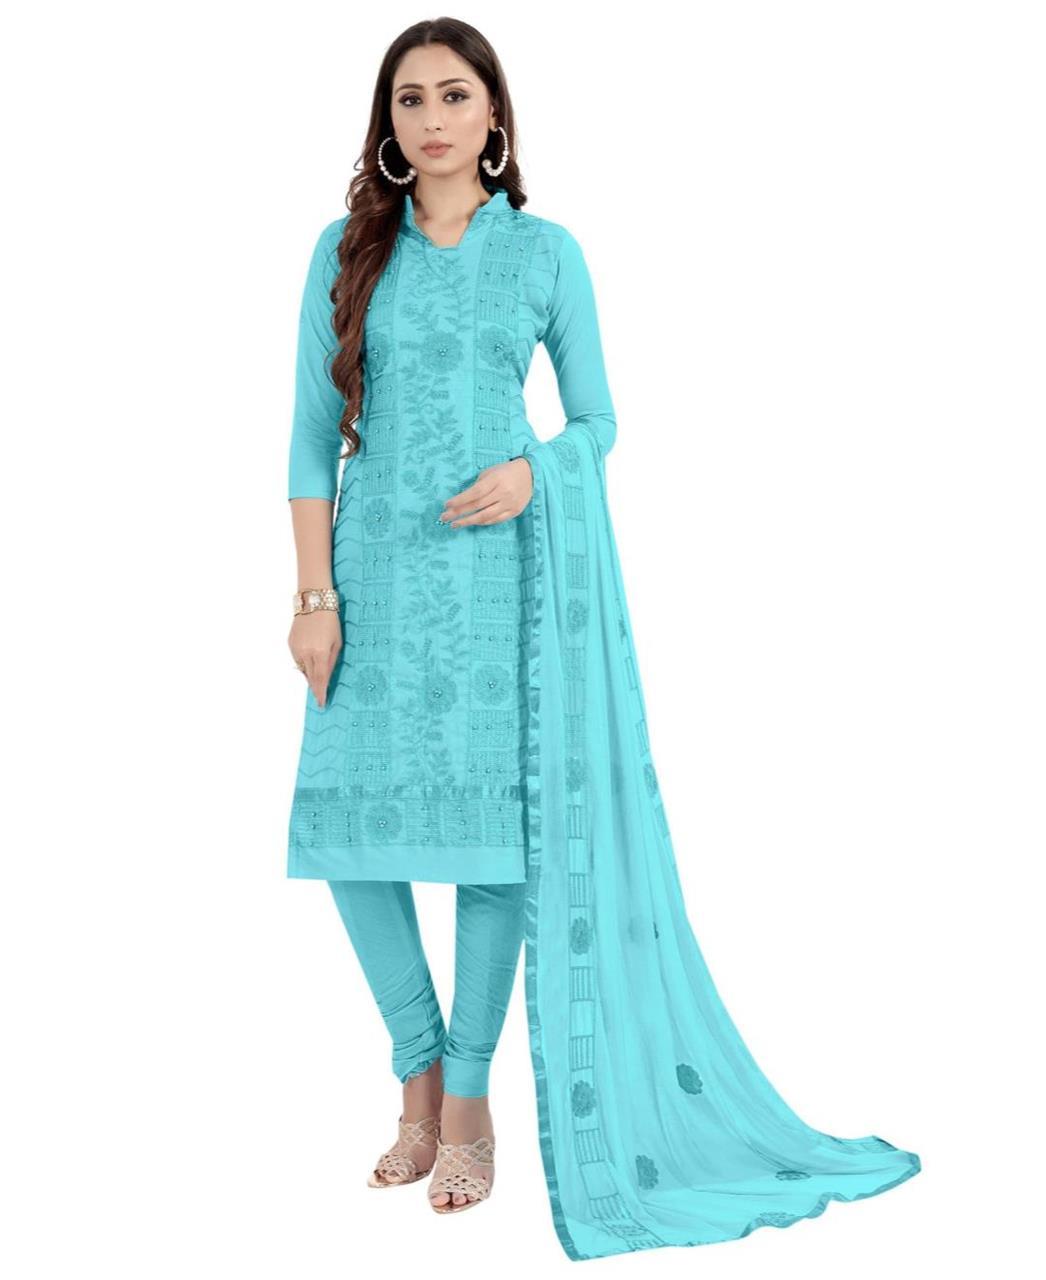 HandWorked Cotton Patiyala Suit Salwar in Sky Blue